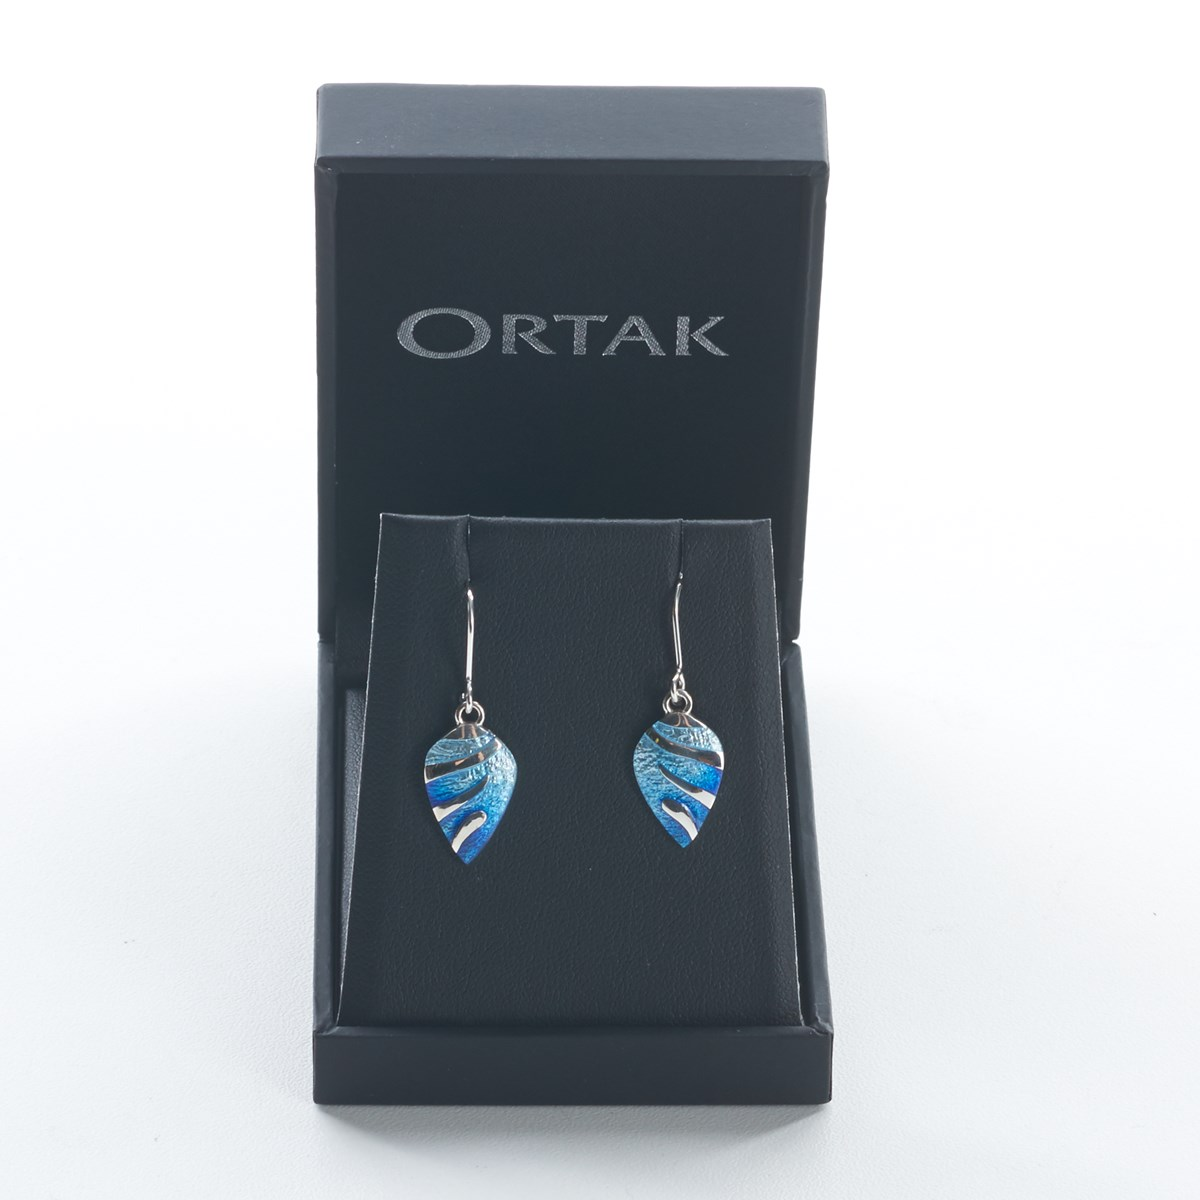 6f38a1e31 18170061_sterling_silver_earrings_mirage_oasis_3215_3248 ·  18170061_sterling_silver_earrings_mirage_oasis_3216_3249. Previous; Next. Sterling  Silver Mirage ...